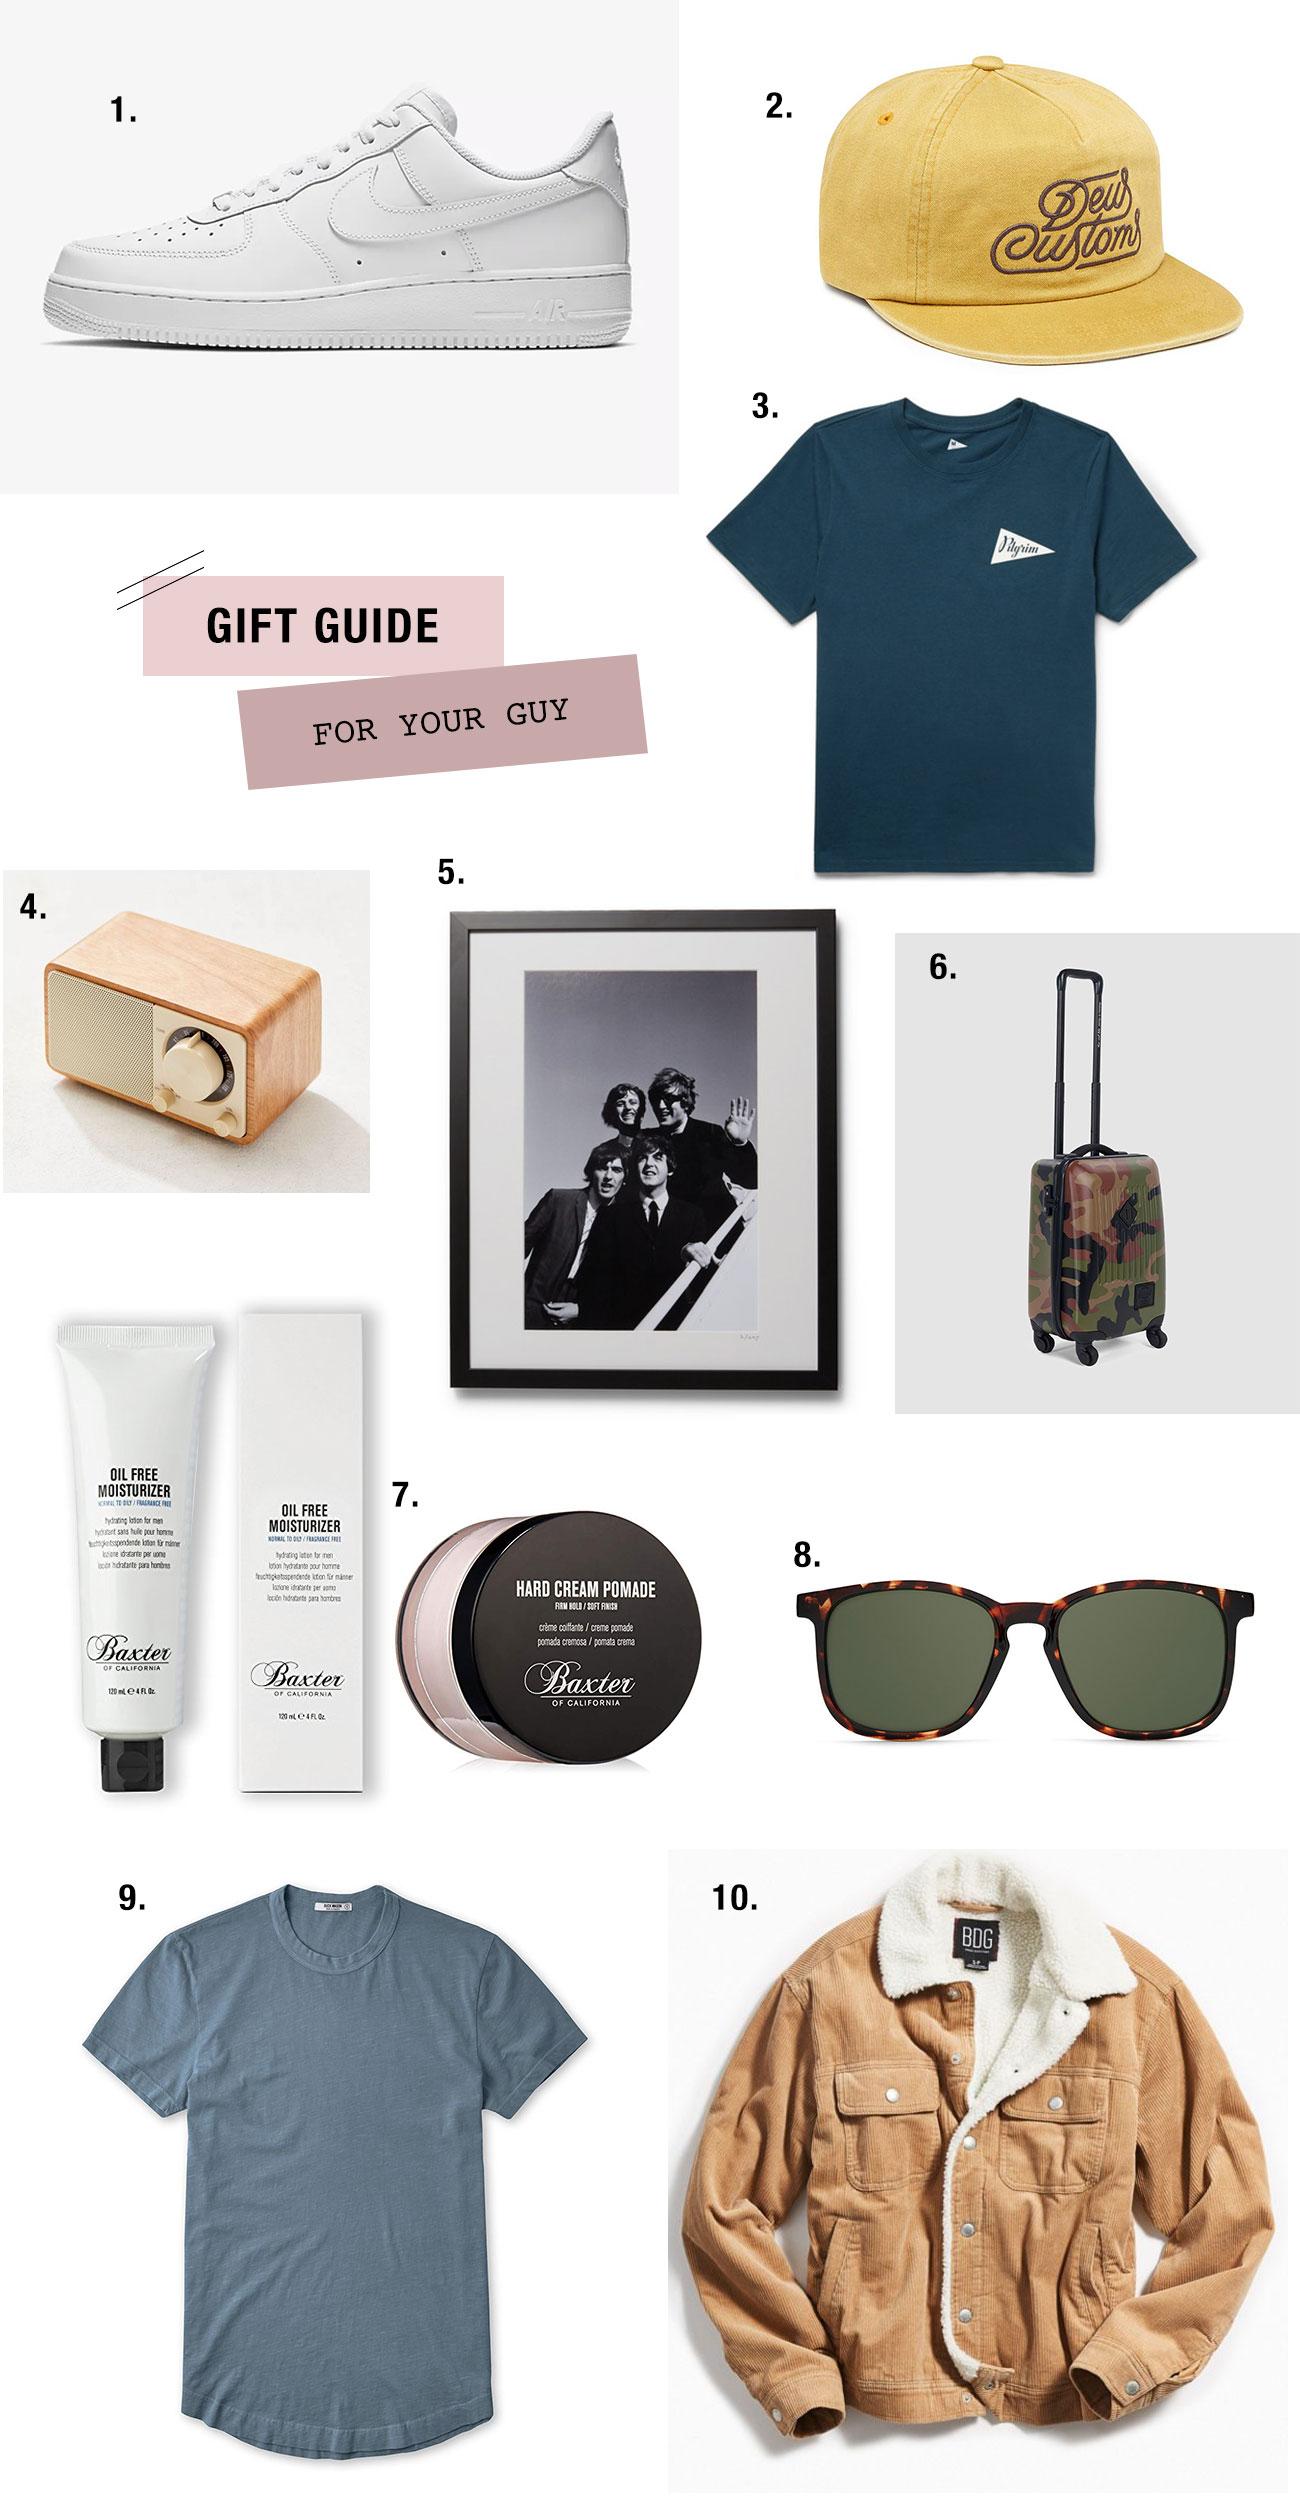 2018 Gift Guide for Guys